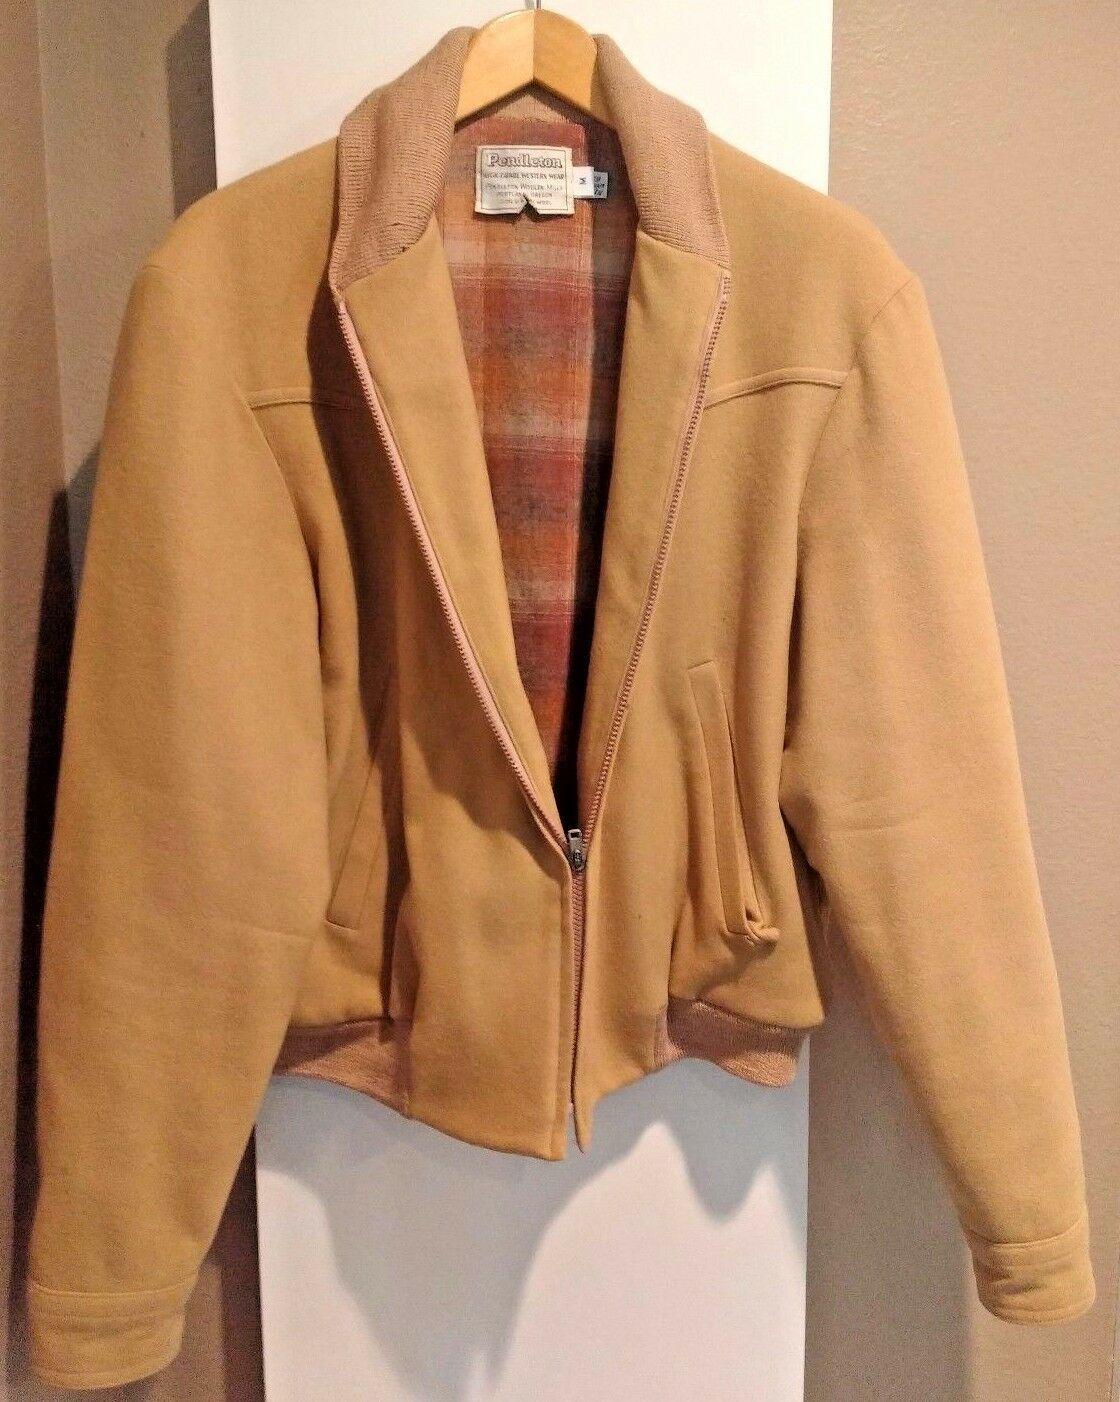 d66f7b0d1caf2 Vintage Pendleton Jacket - Size M - 100% and 50 similar items